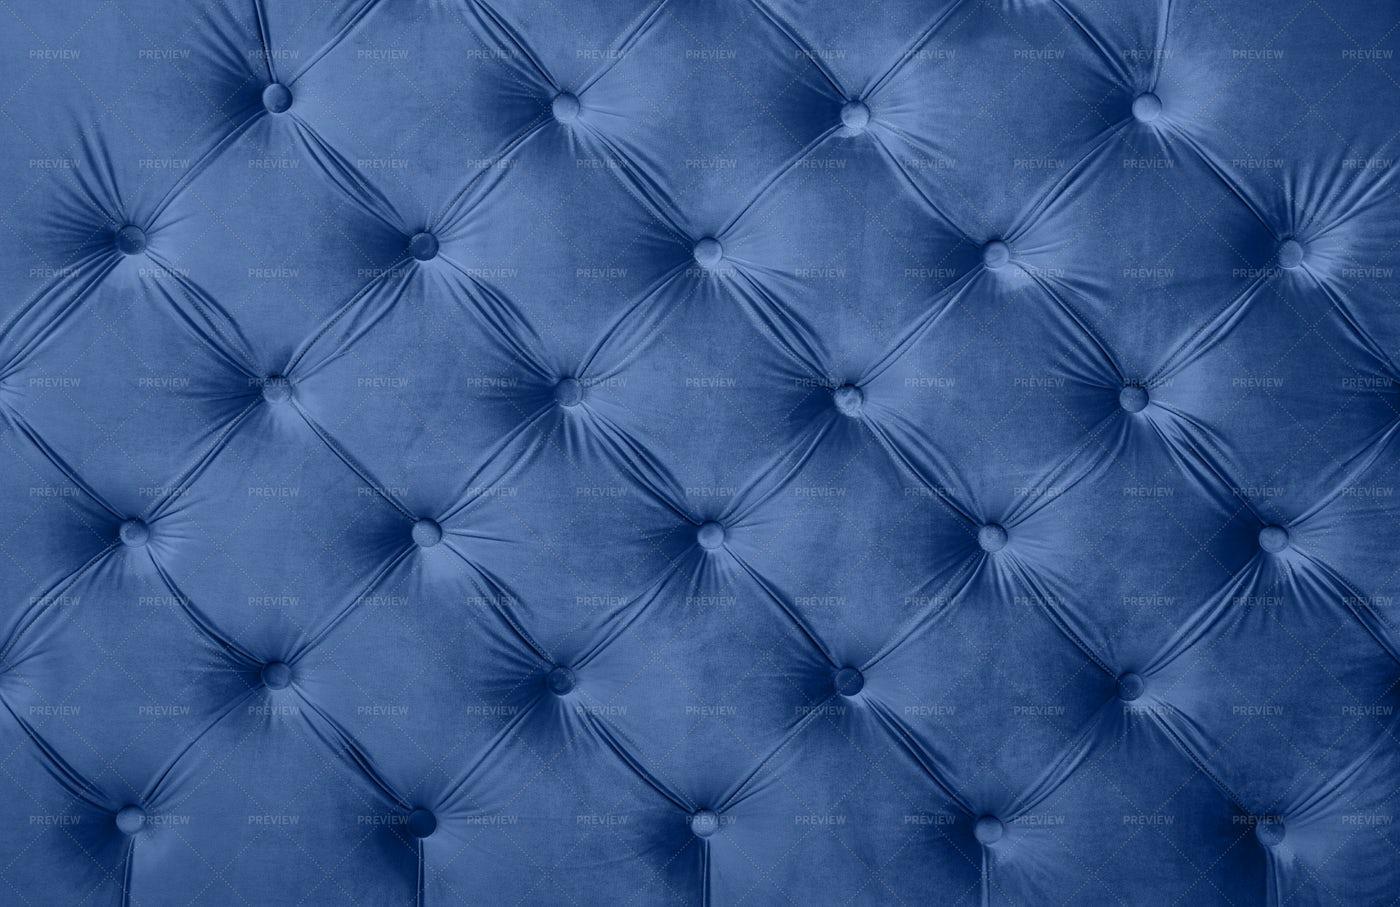 Blue Capitone Upholstery: Stock Photos